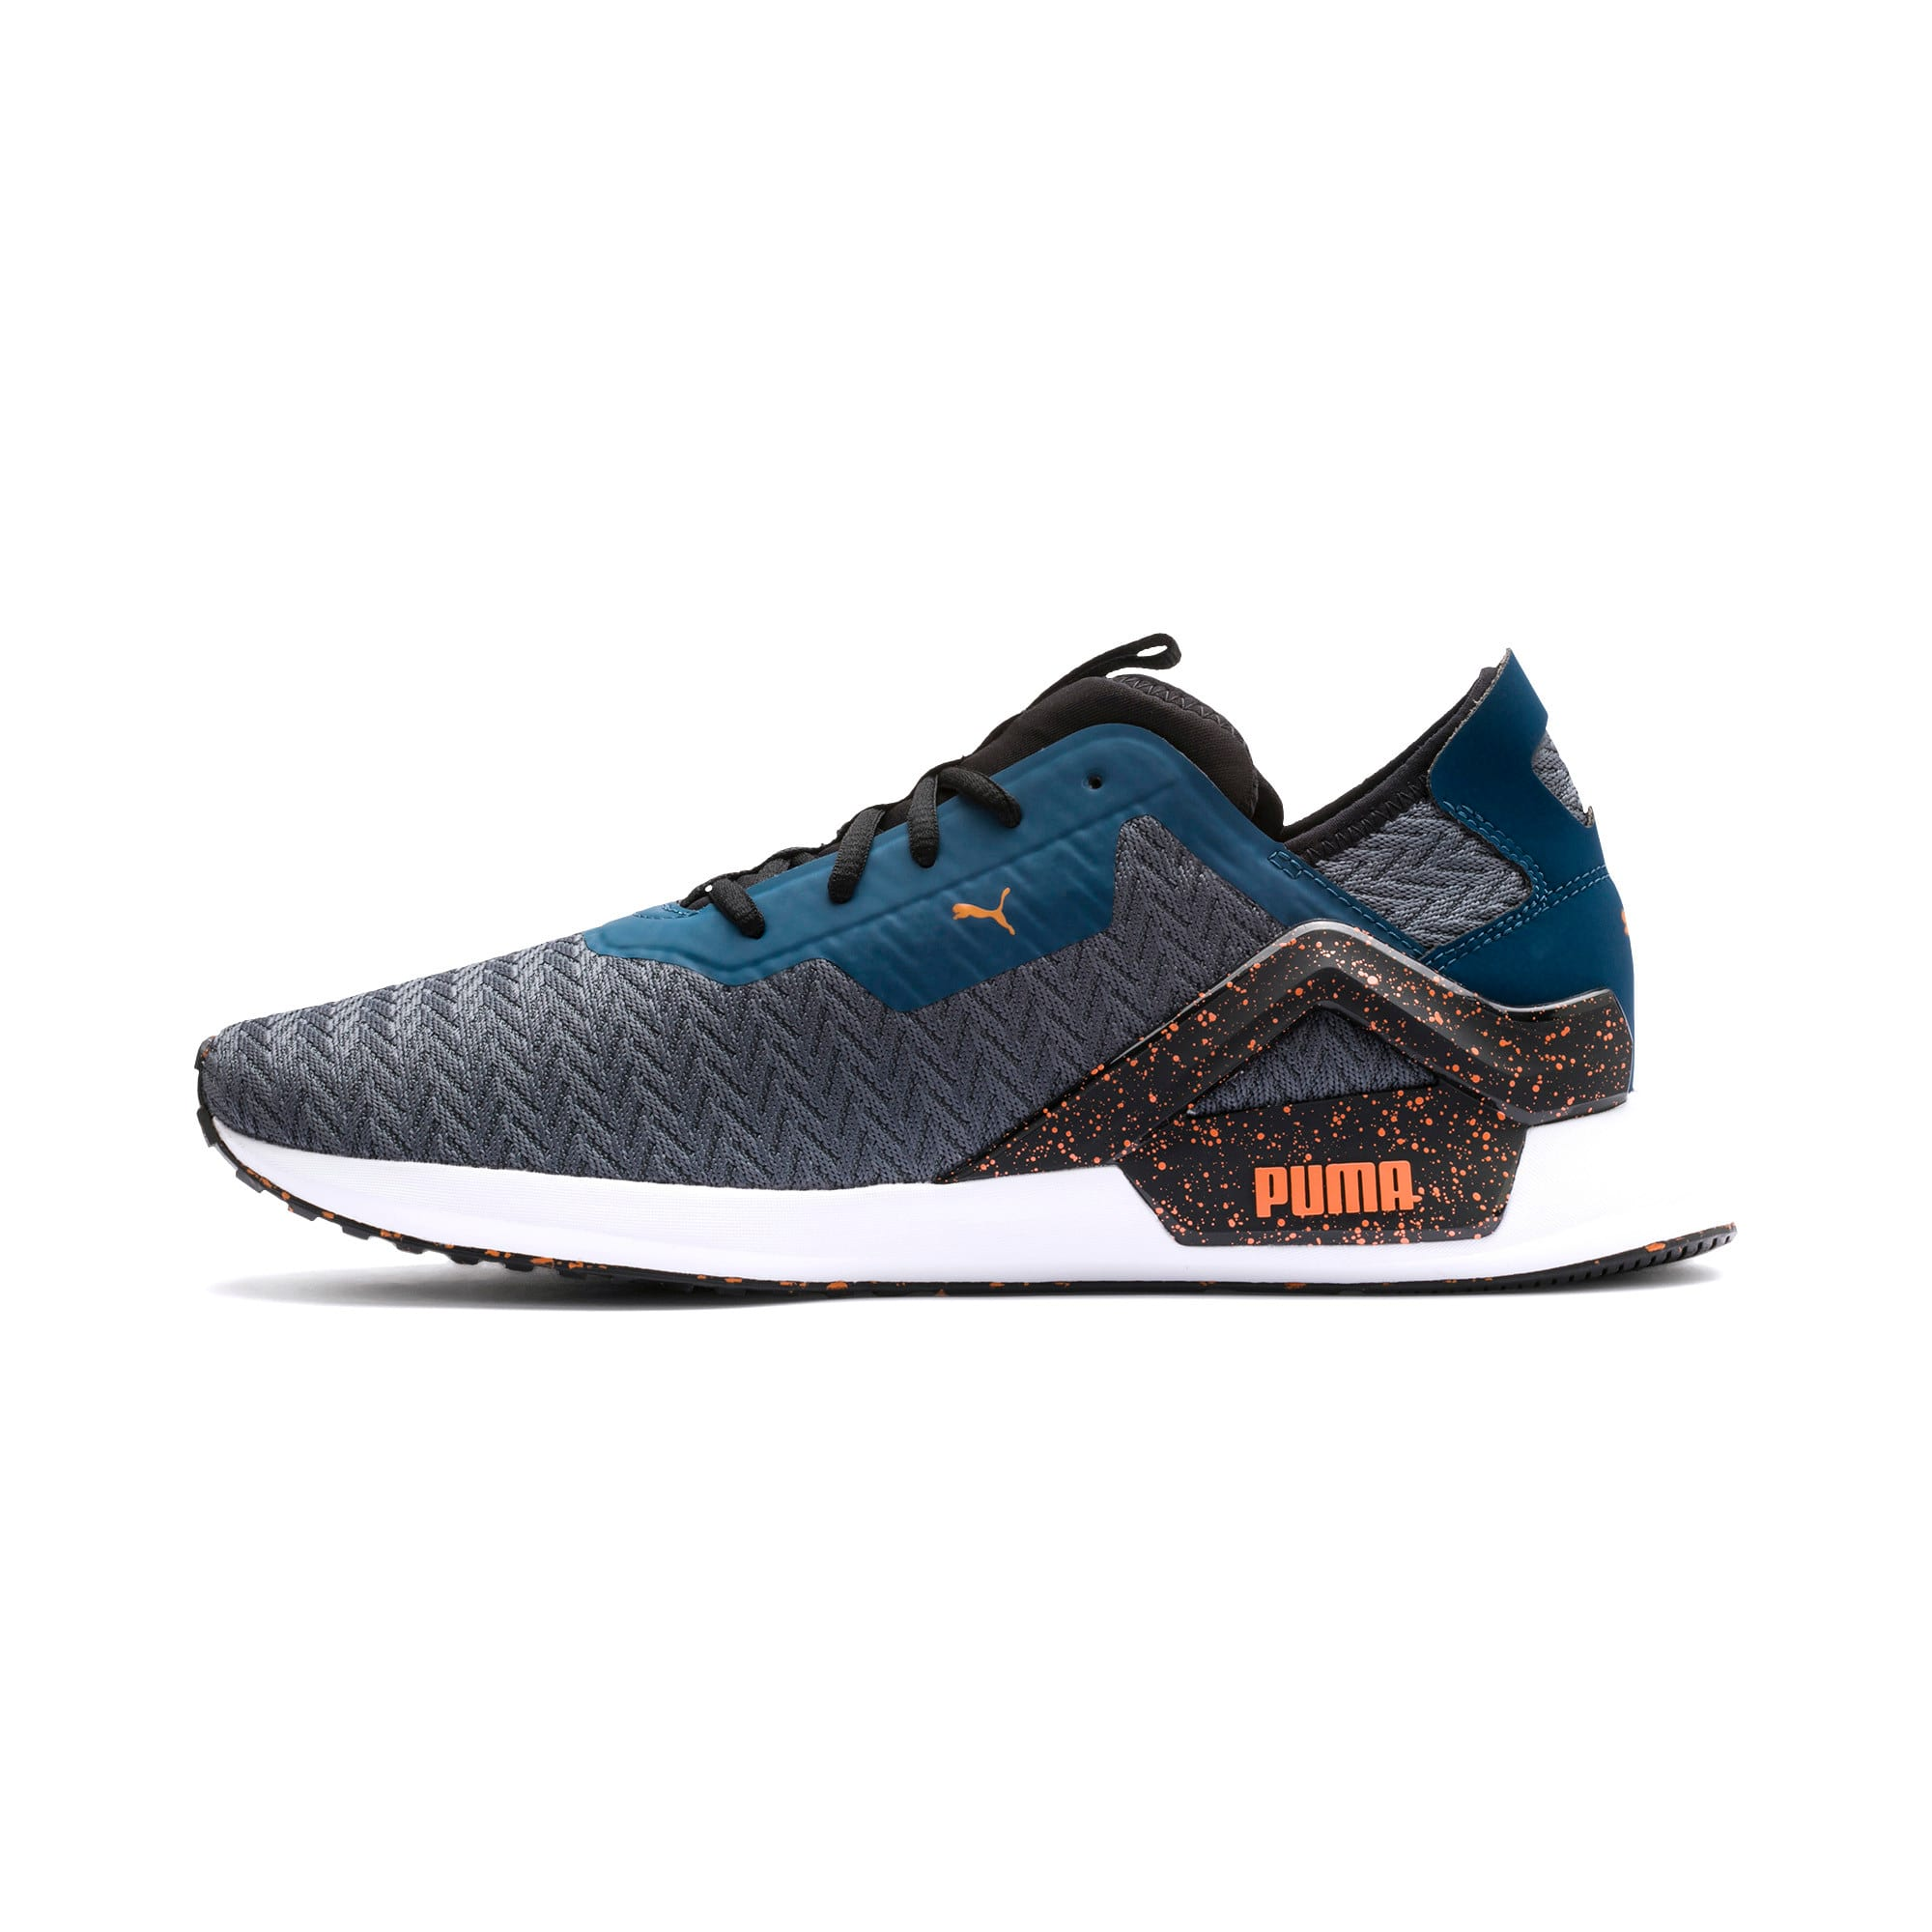 Thumbnail 1 of Rogue X Terrain Men's Training Shoes, CASTLEROCK-Gibr Sea-J Orange, medium